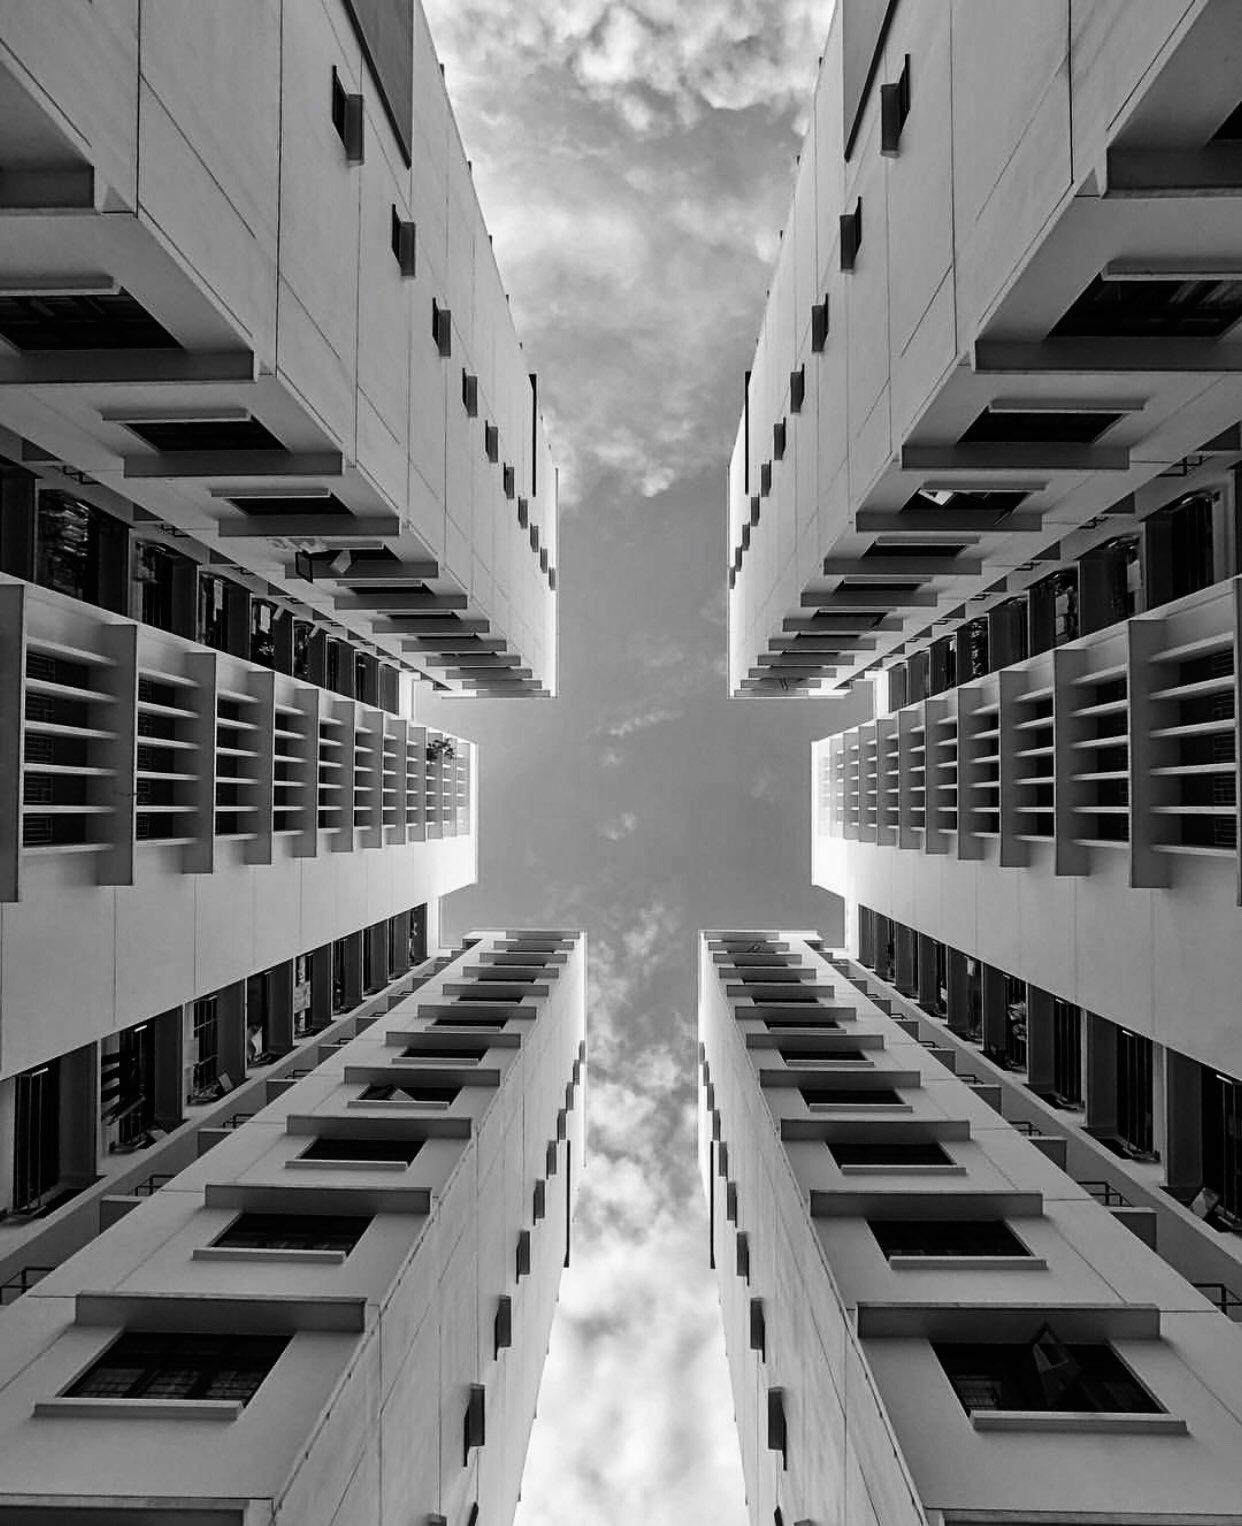 black_and_white_street_photography_21.jpg